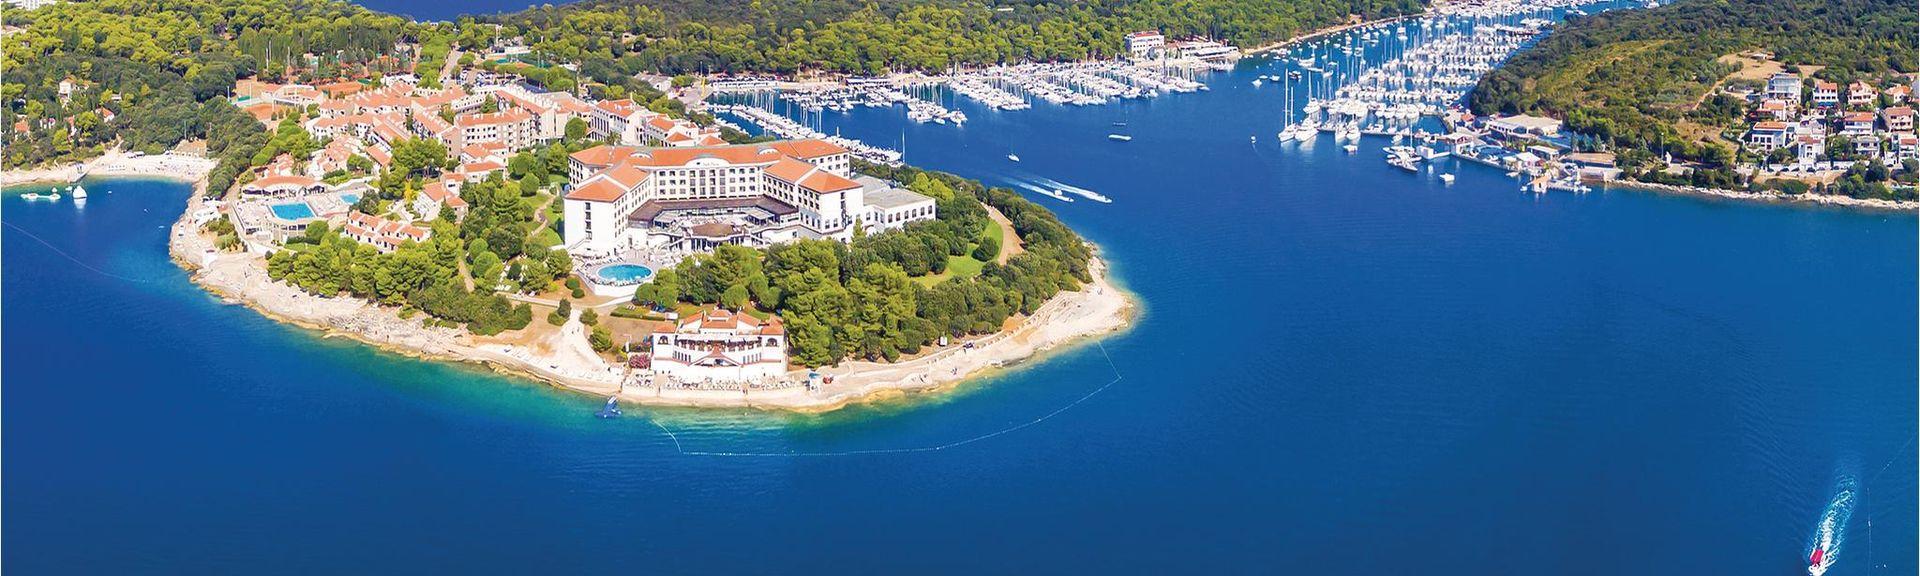 Hreljici, Gespanschaft Istrien, Kroatien